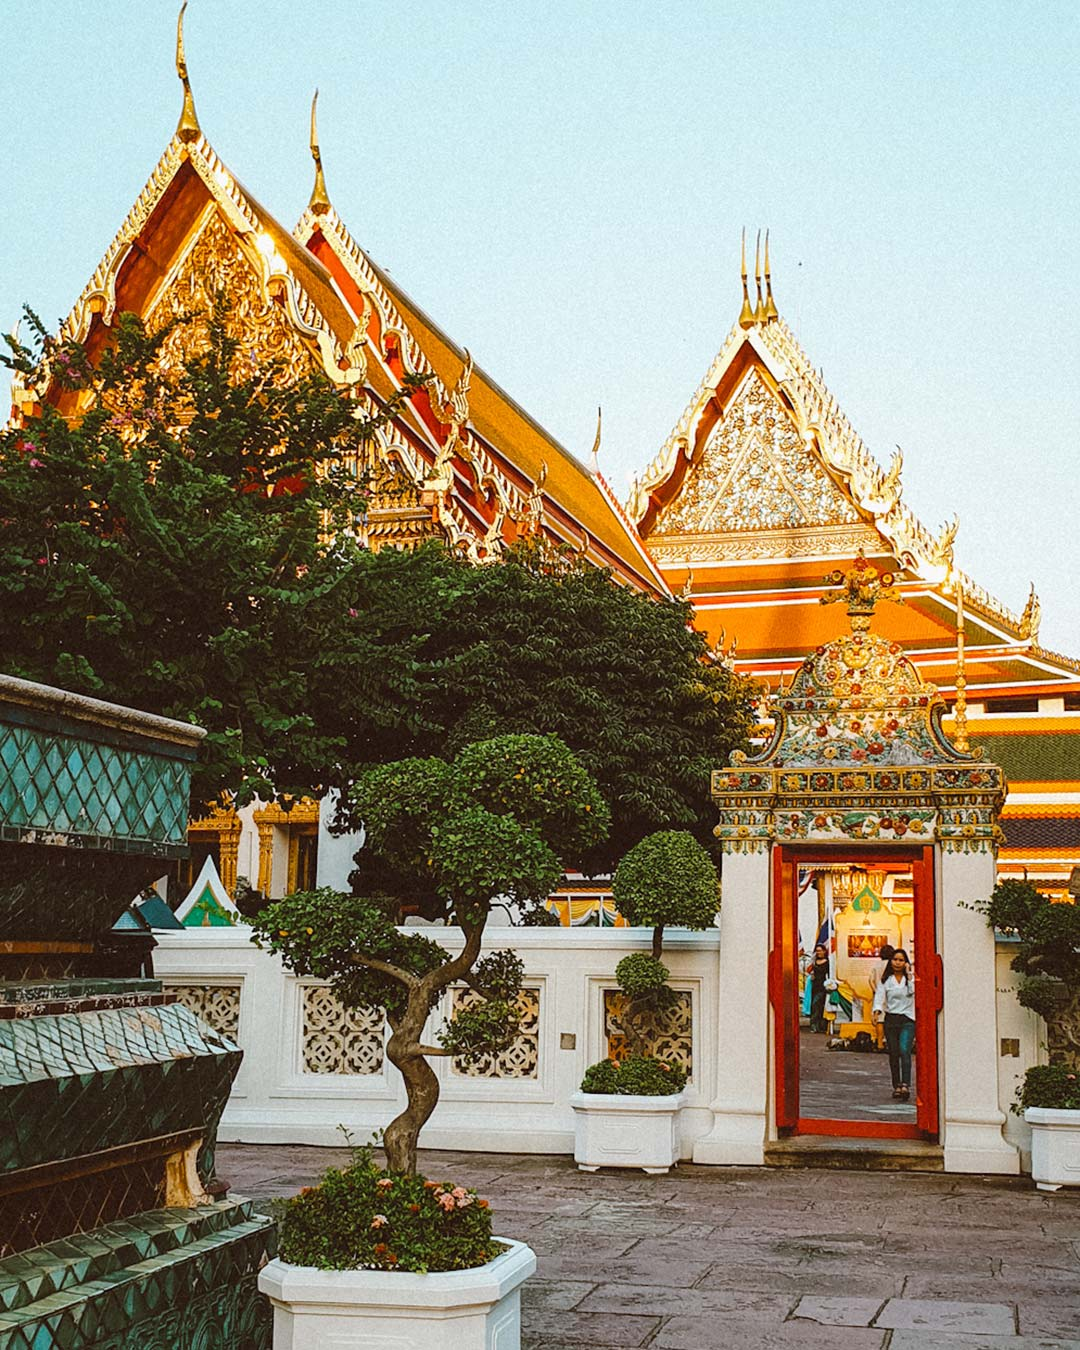 Travel Guide to Bangkok